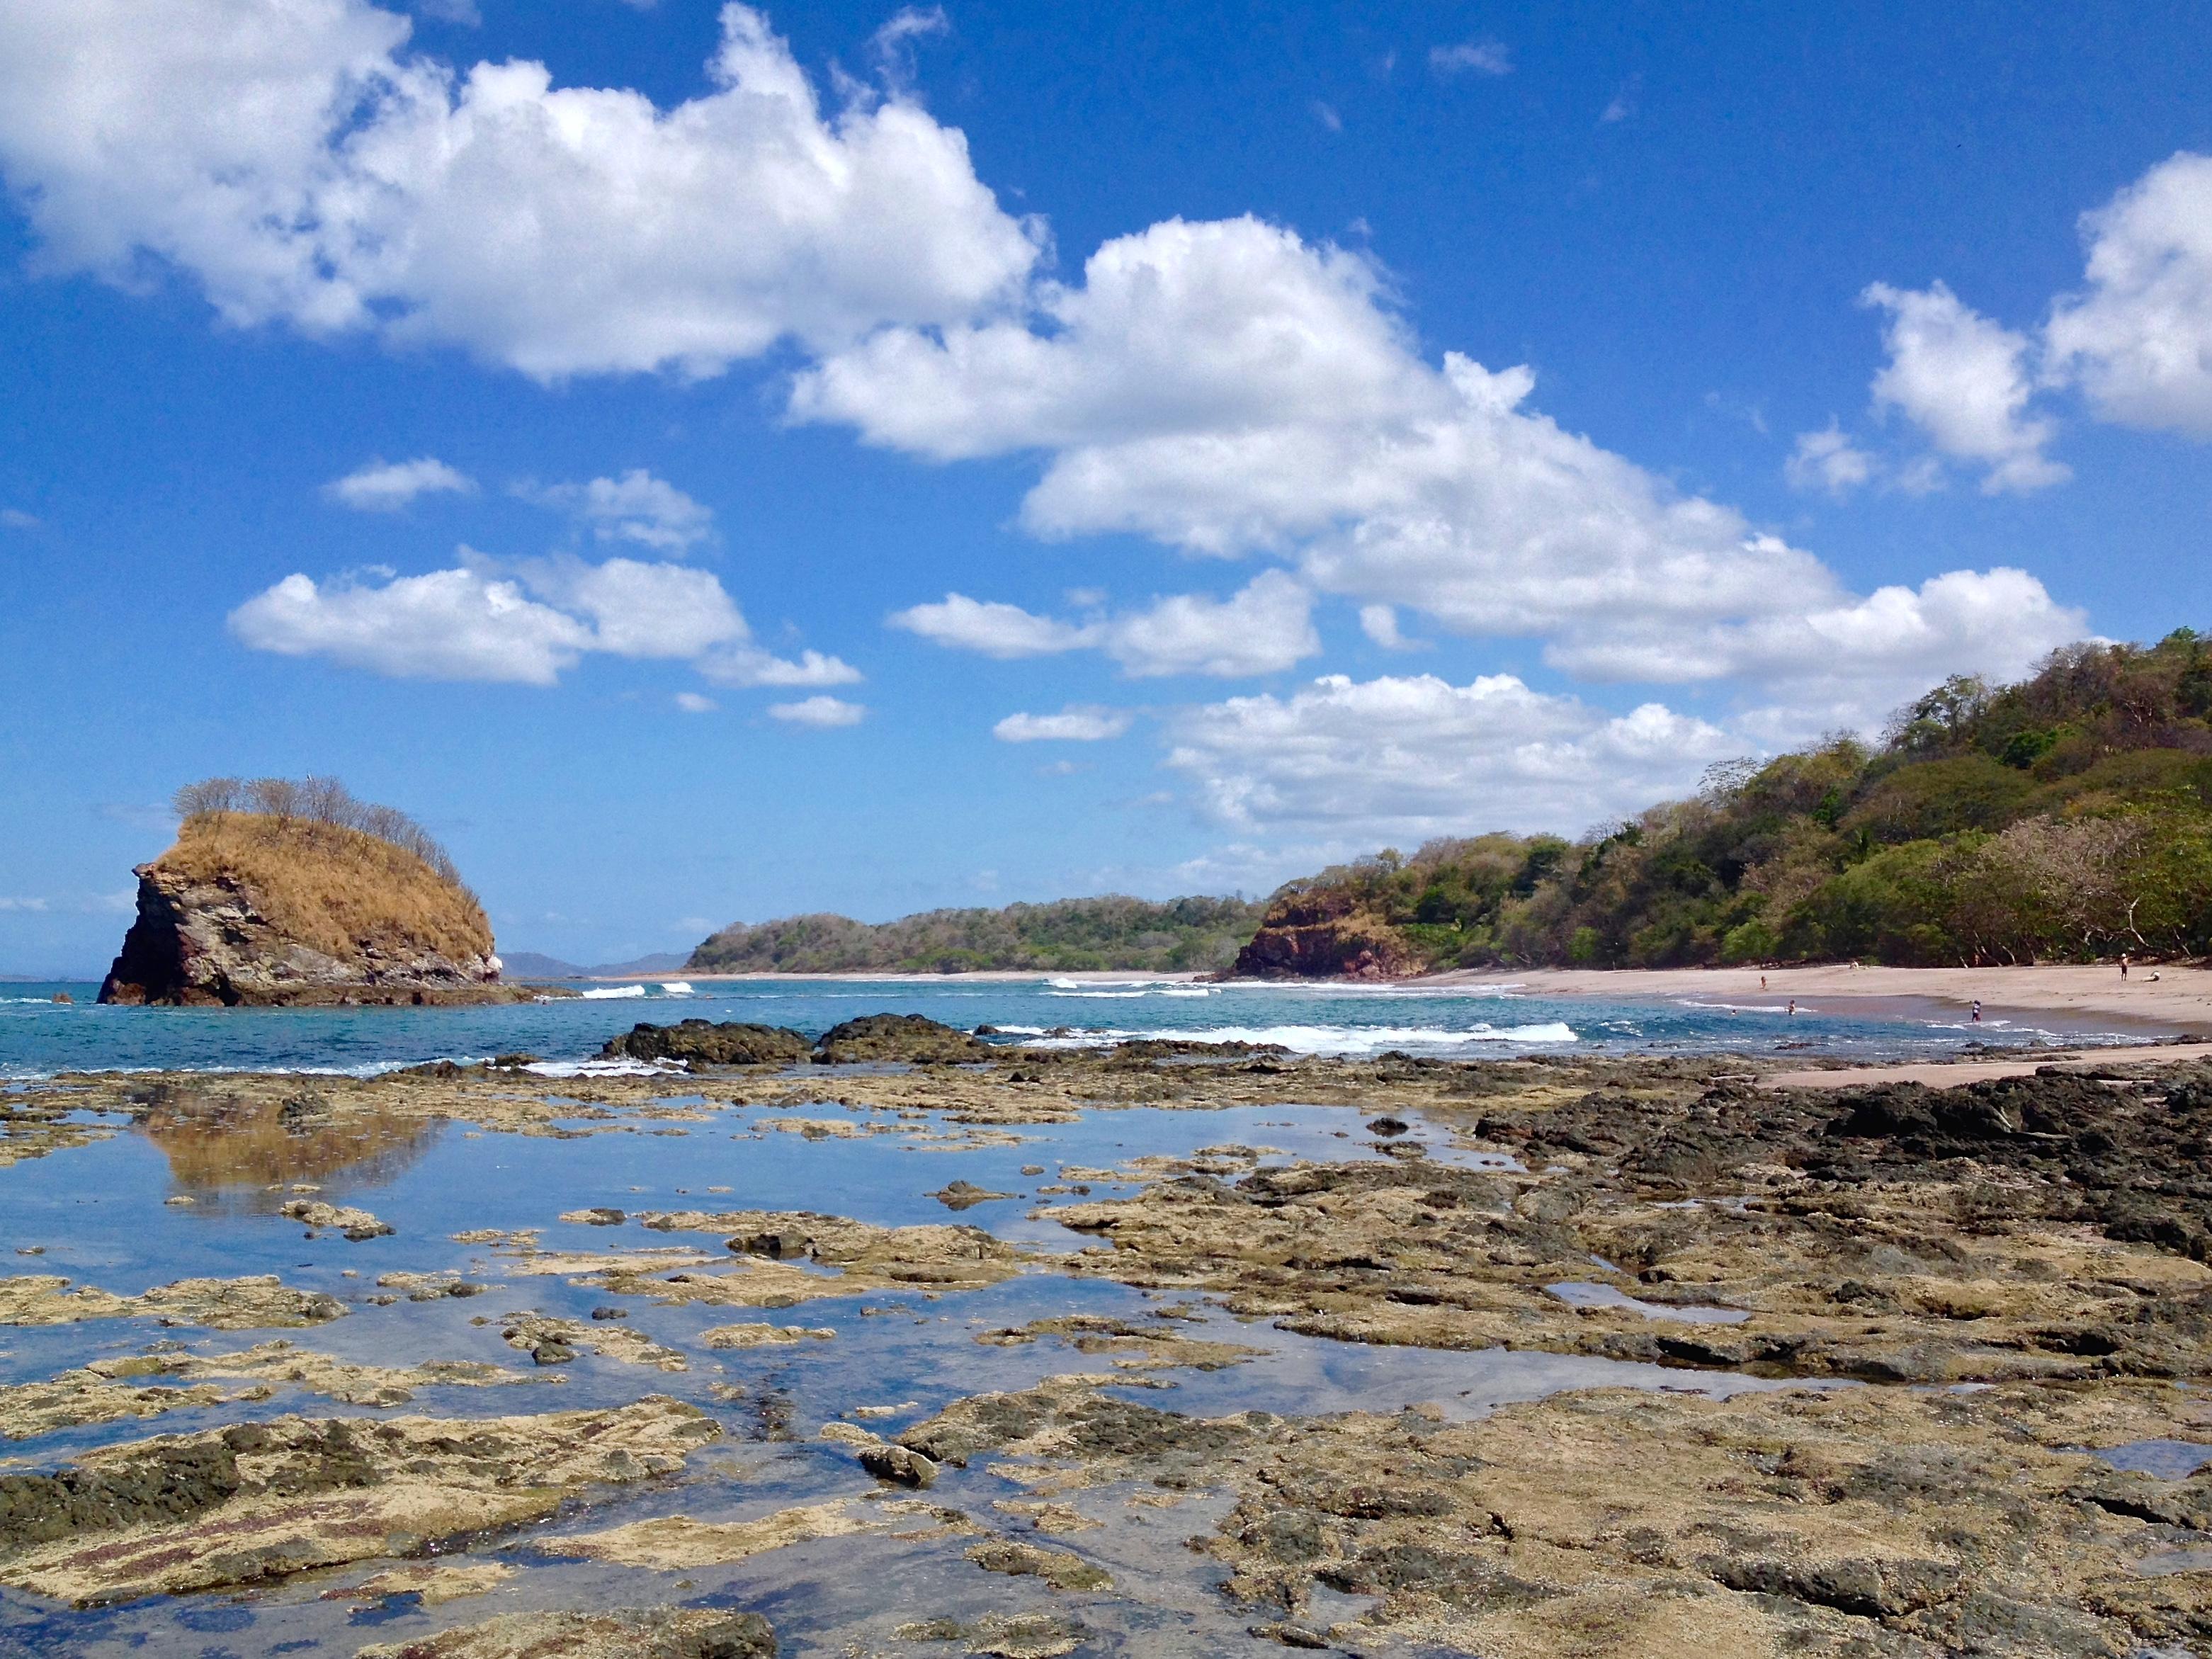 Guanacaste Beaches Luxury Costa Rica Vacations with Pura Vida House